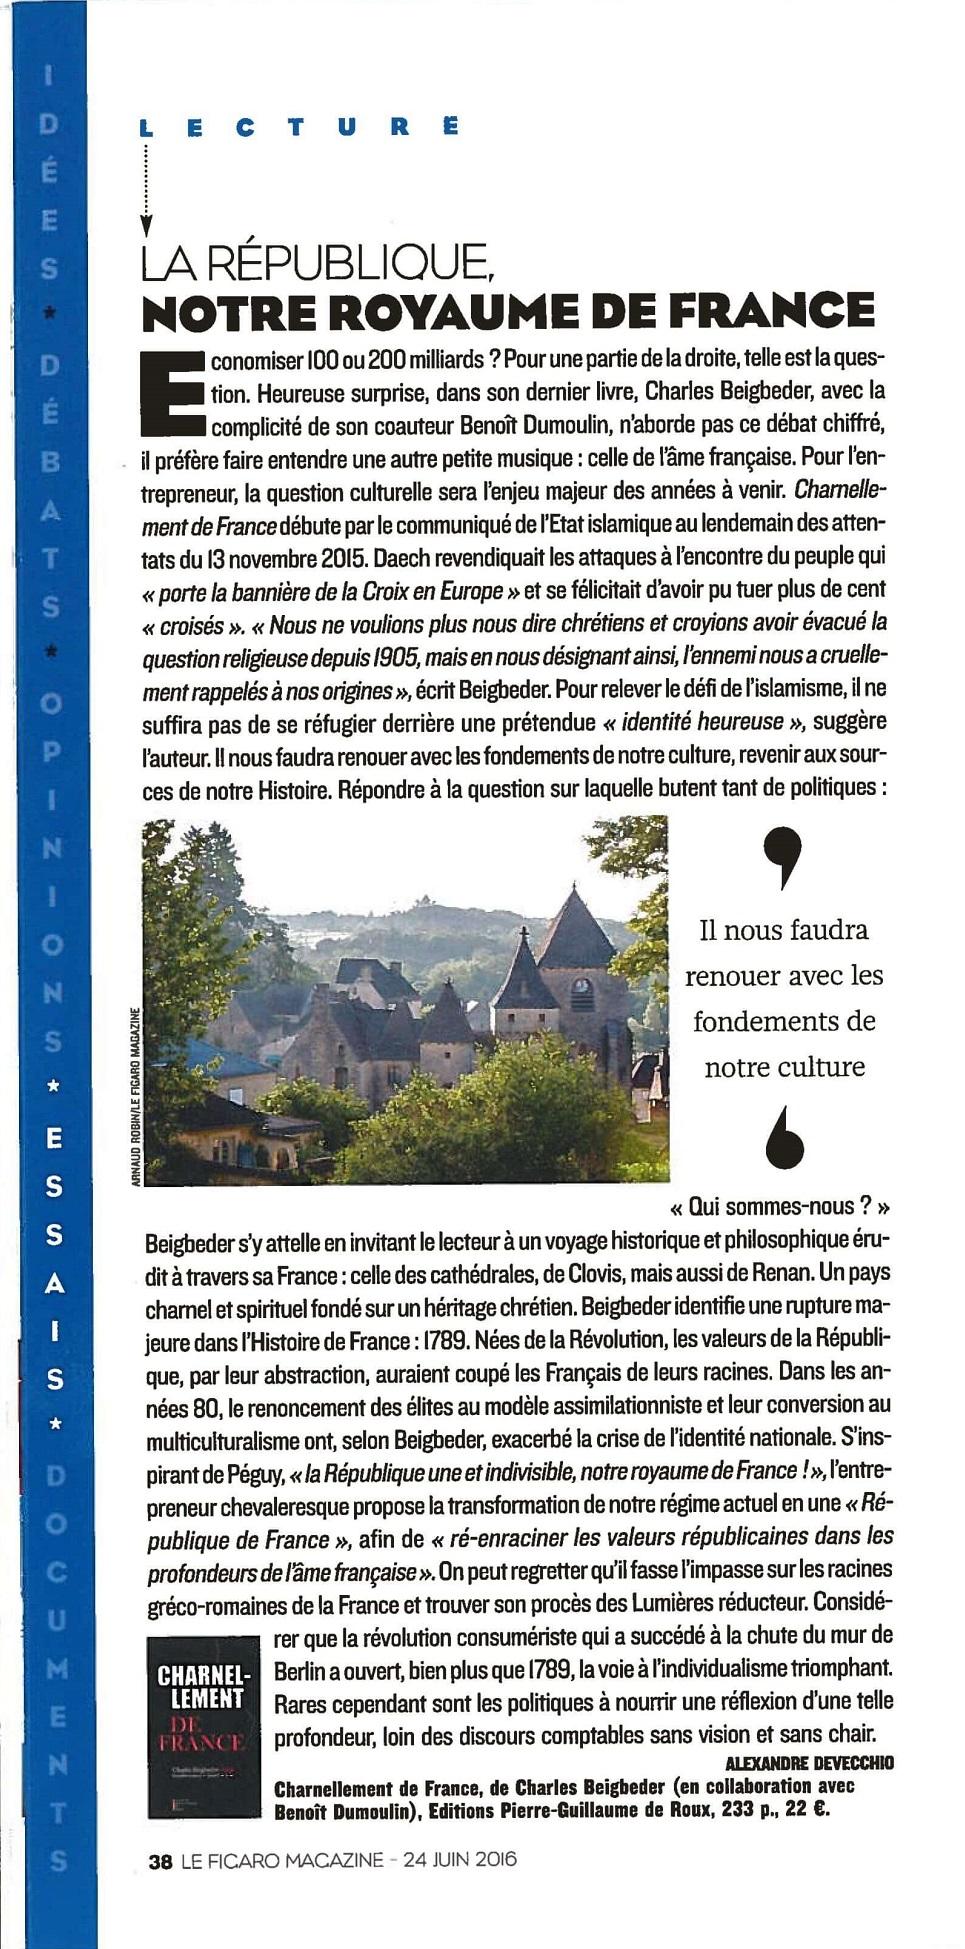 Le Figaro Magazine 240616 (3)